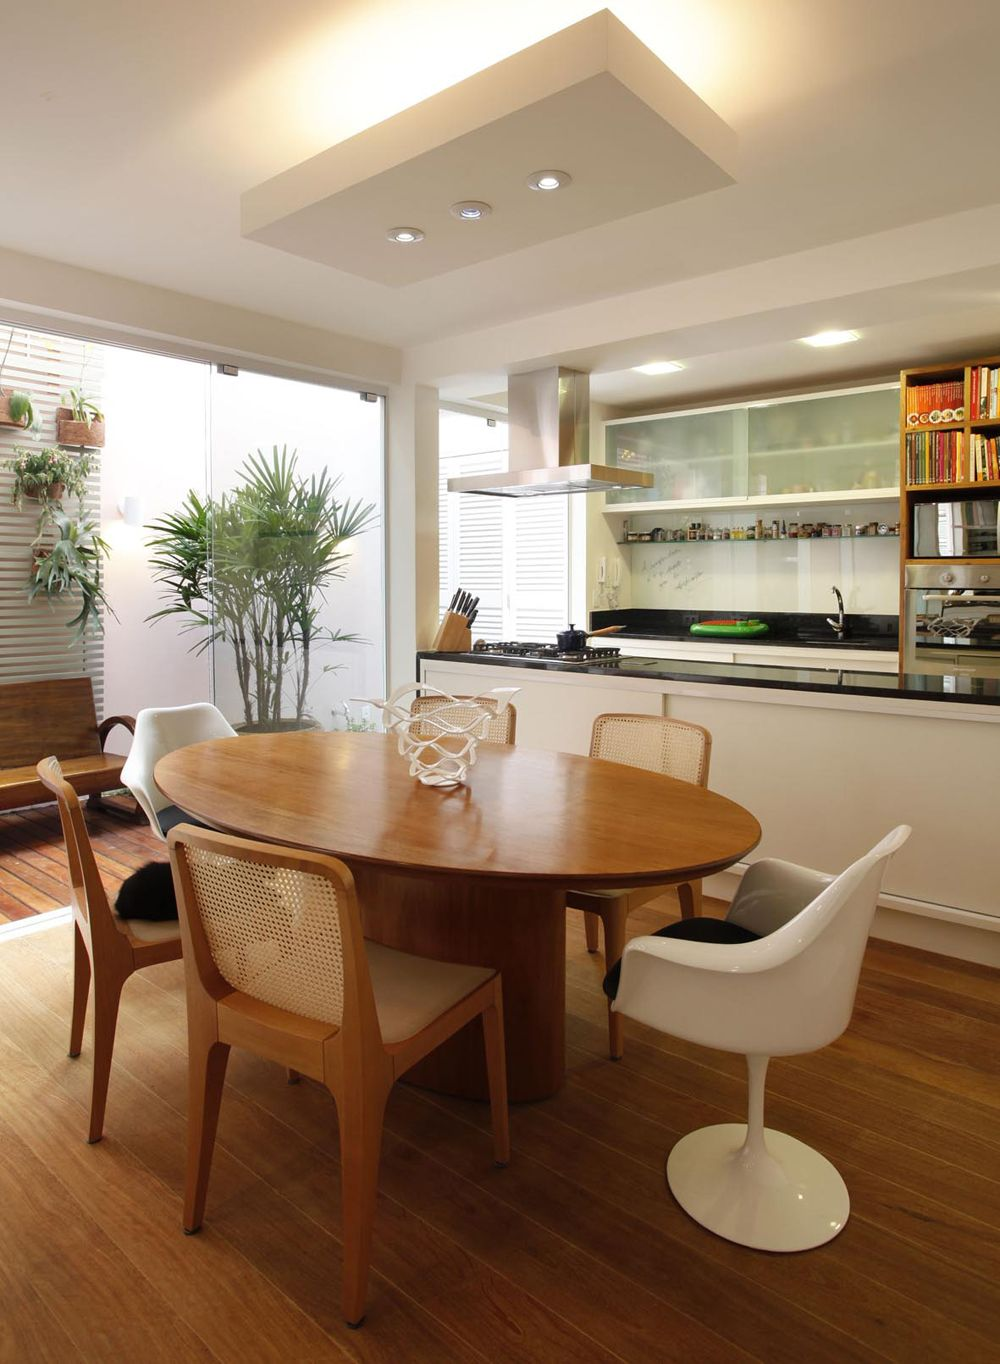 Cozinha Americana Aberta Integrada Sala Jantar Mesa Redonda